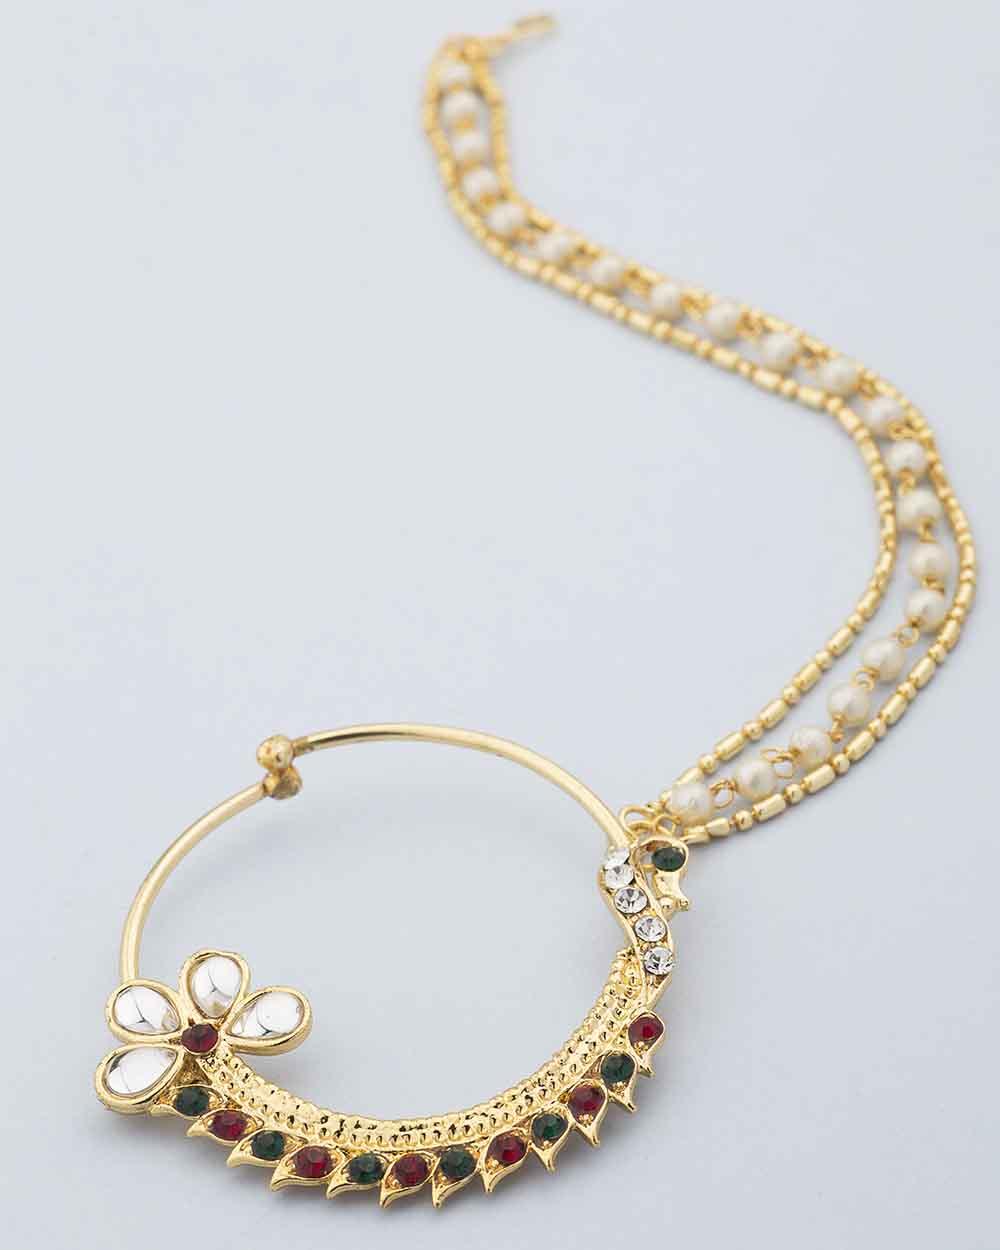 Buy Peacock Design Nose Ring For Women Online India | Voylla